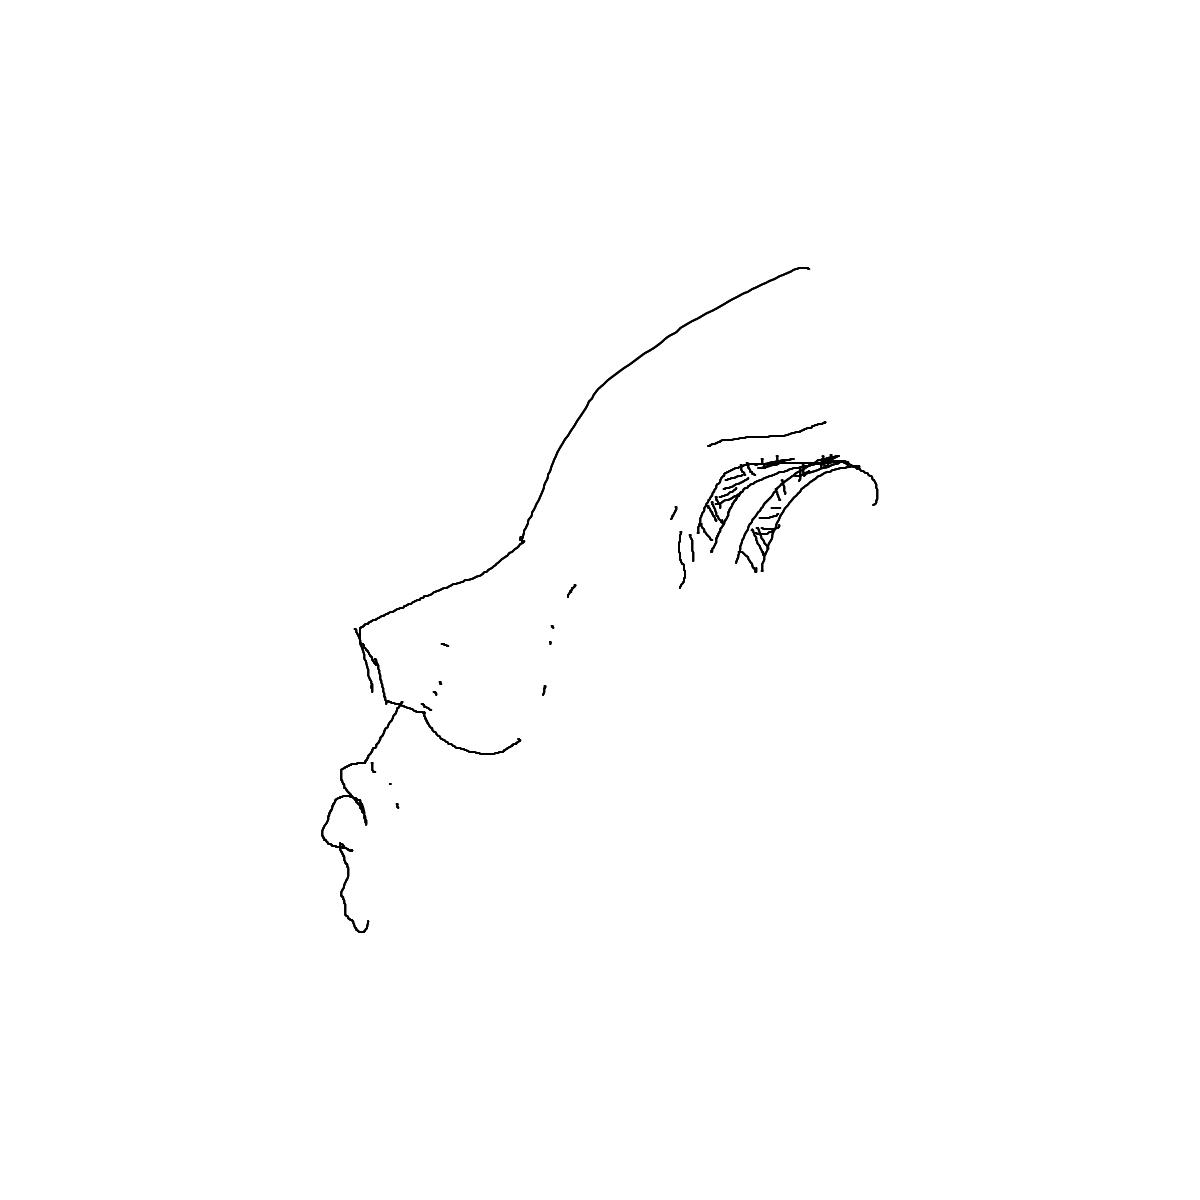 BAAAM drawing#22112 lat:78.4174575805664000lng: -4.4291238784790040